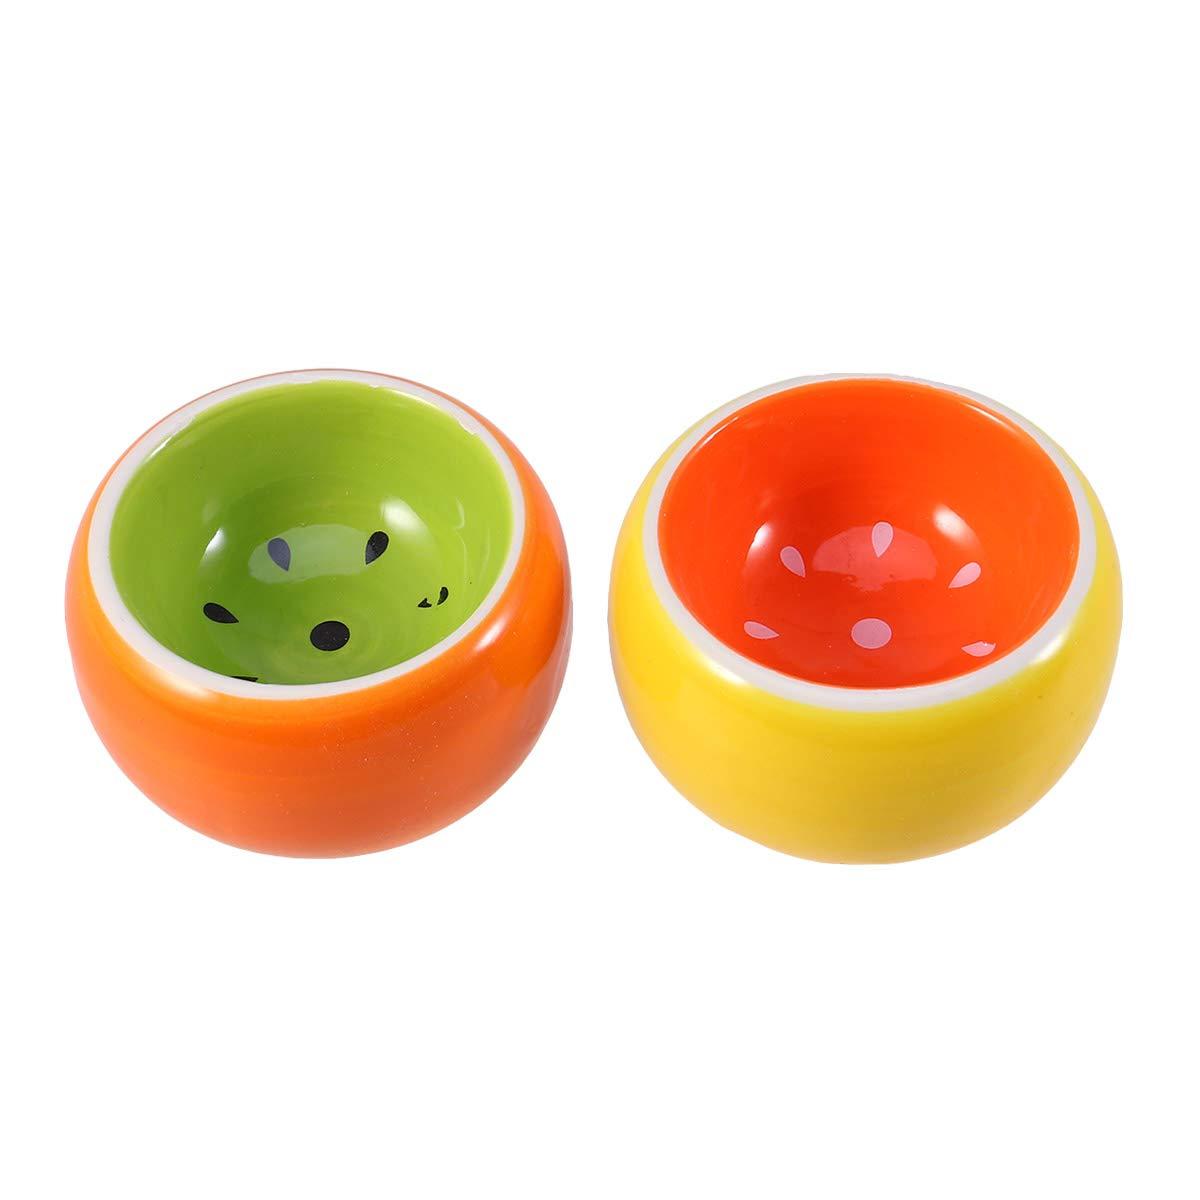 POPETPOP 2pcs Ceramic Hamster Feeding Bowl Colorful pet Food Bowl for Hamster pet Animal